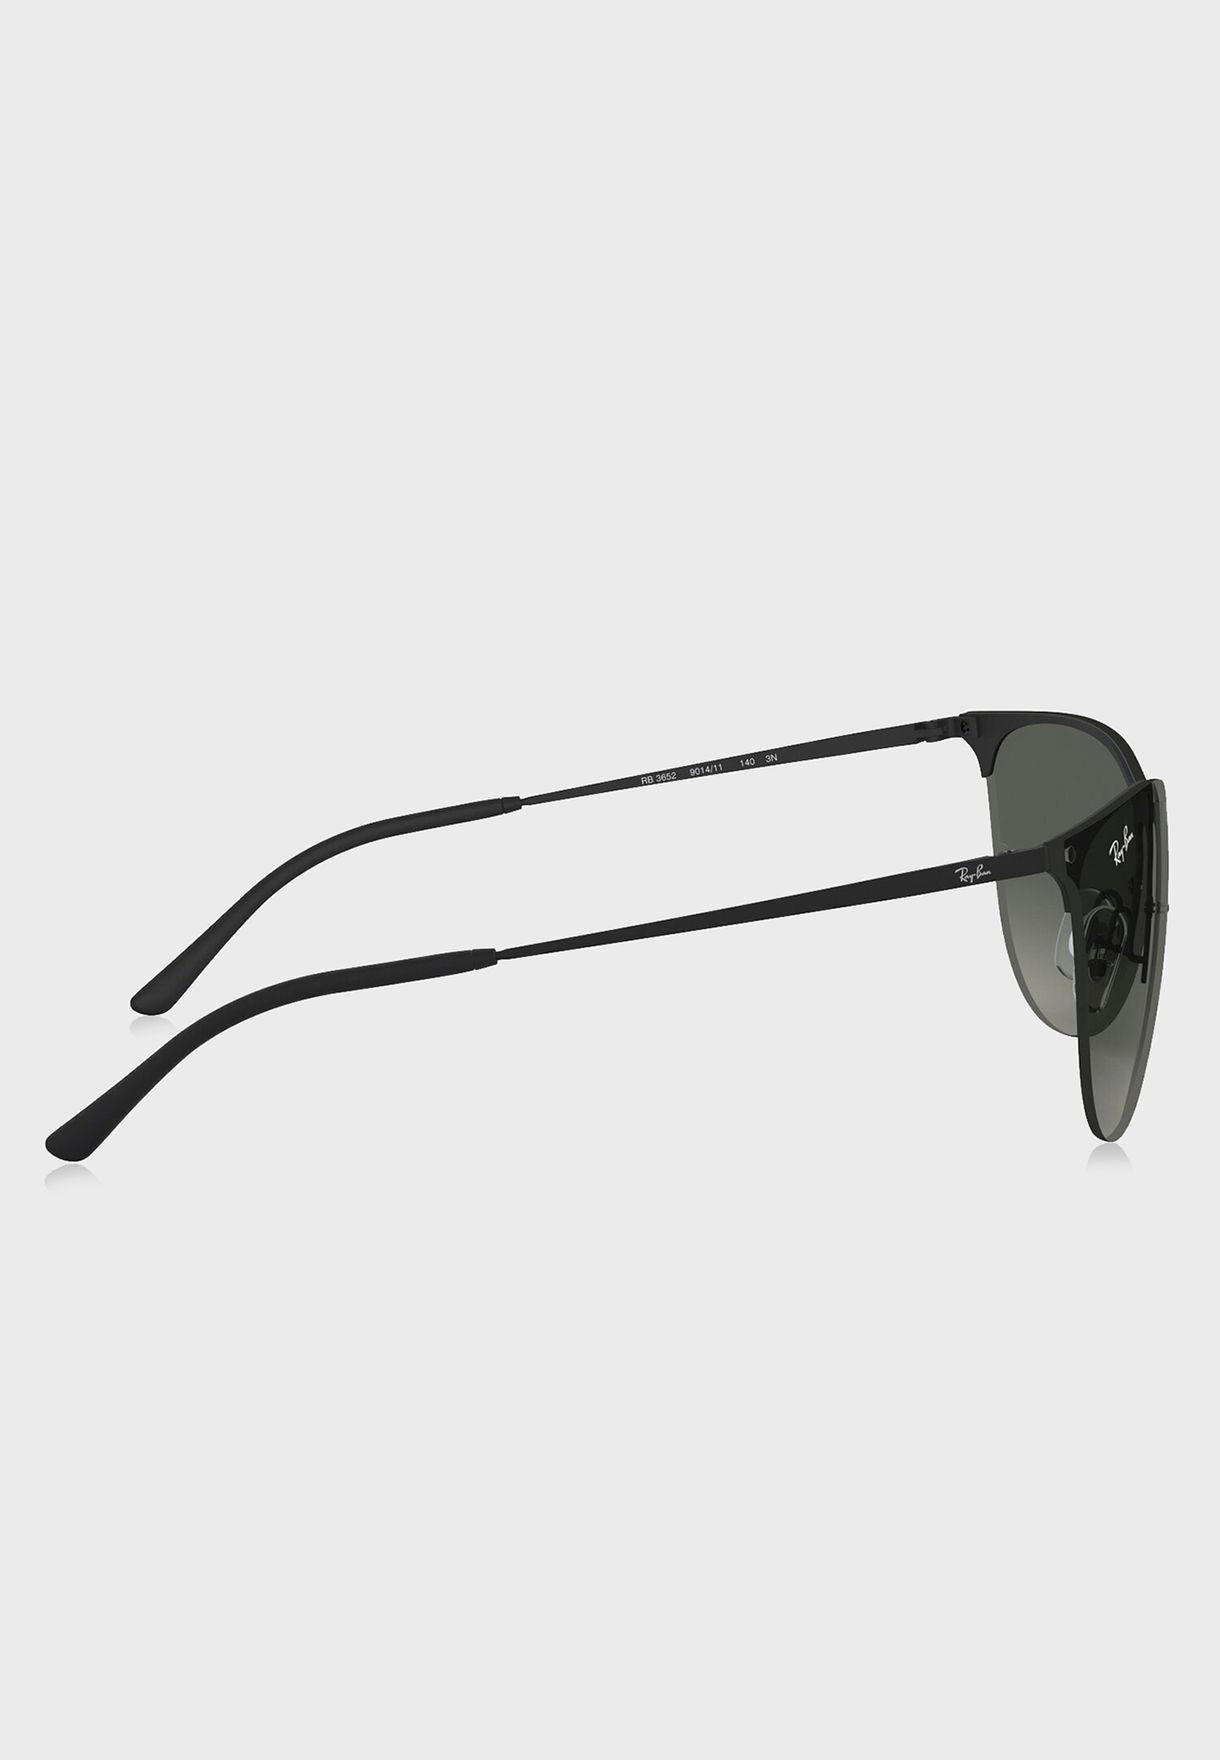 RB3652 Cateye Sunglasses